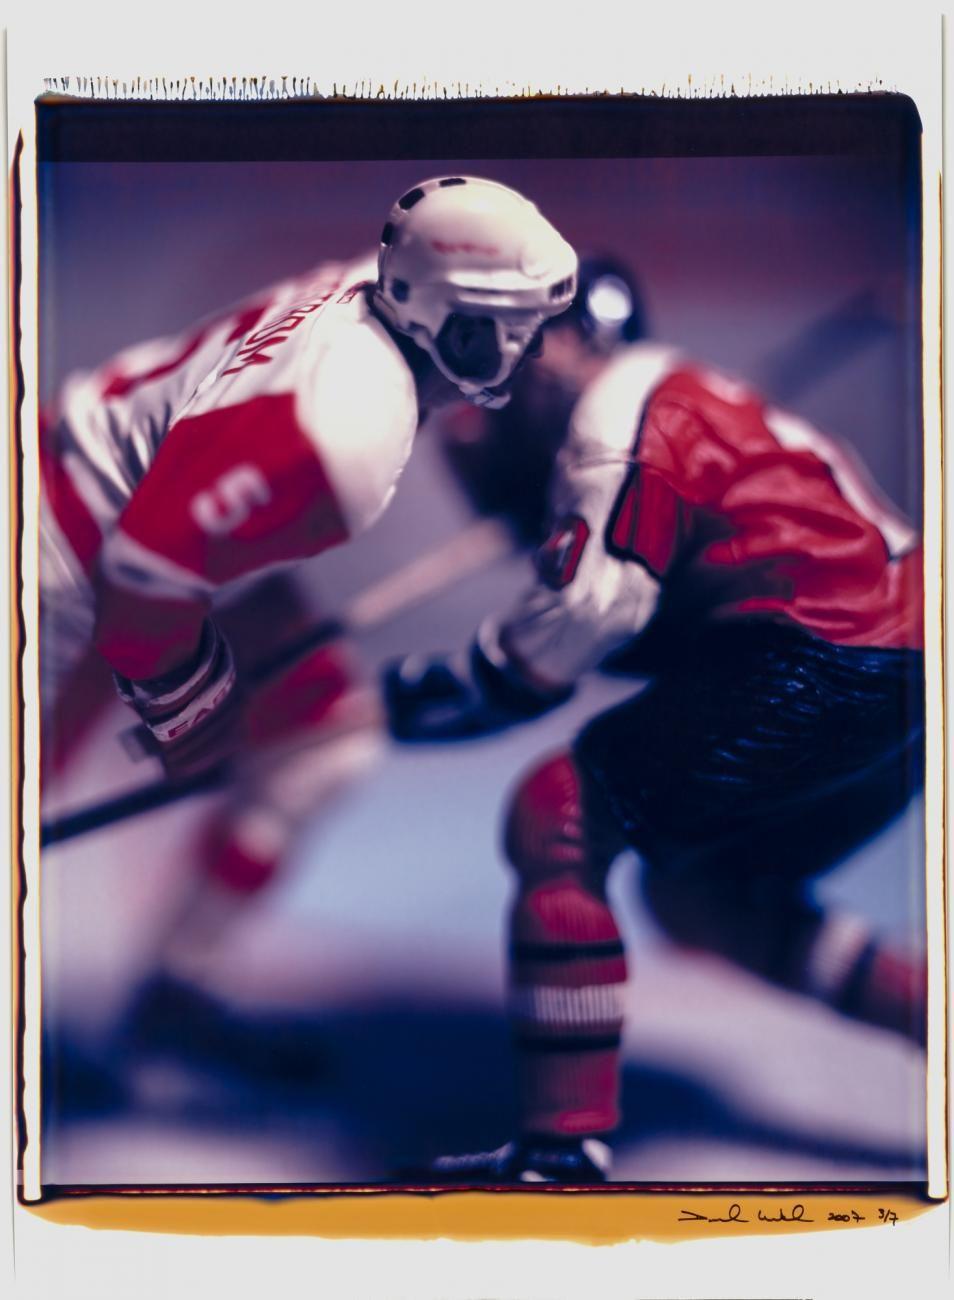 I photograph of hockey player figurines.